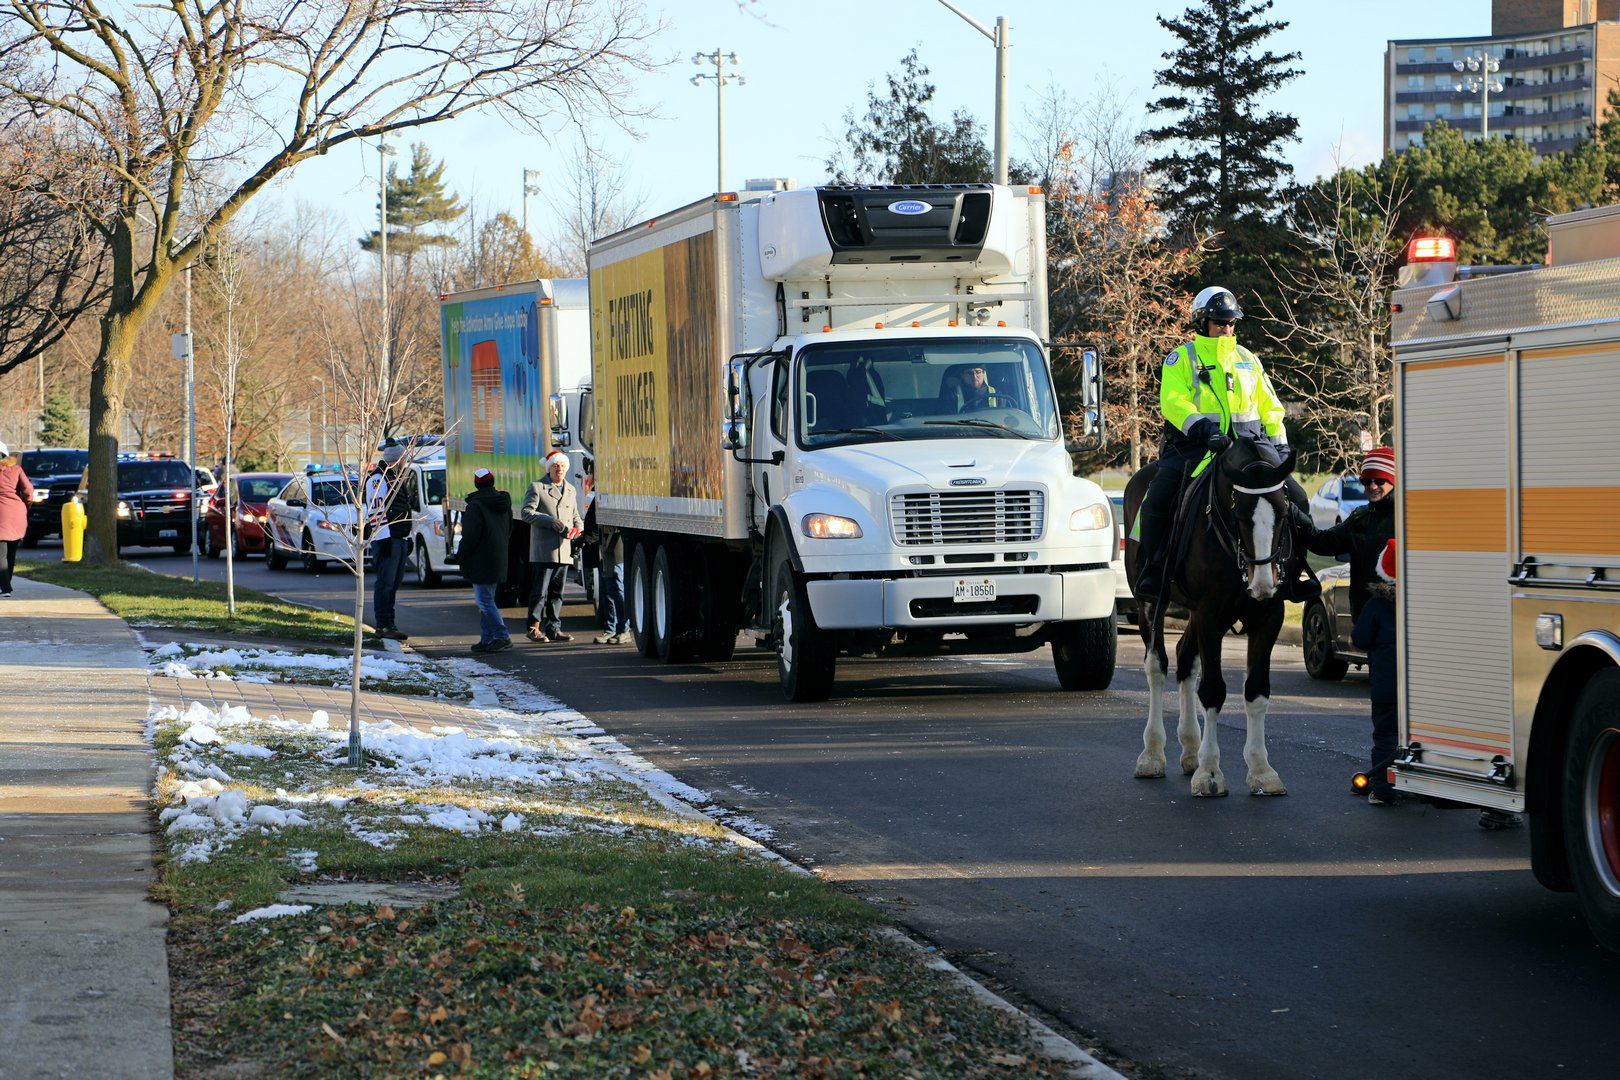 Markland Christmas Caravan 2020 Christmas greetings community spirit: Sharing goodwill for all